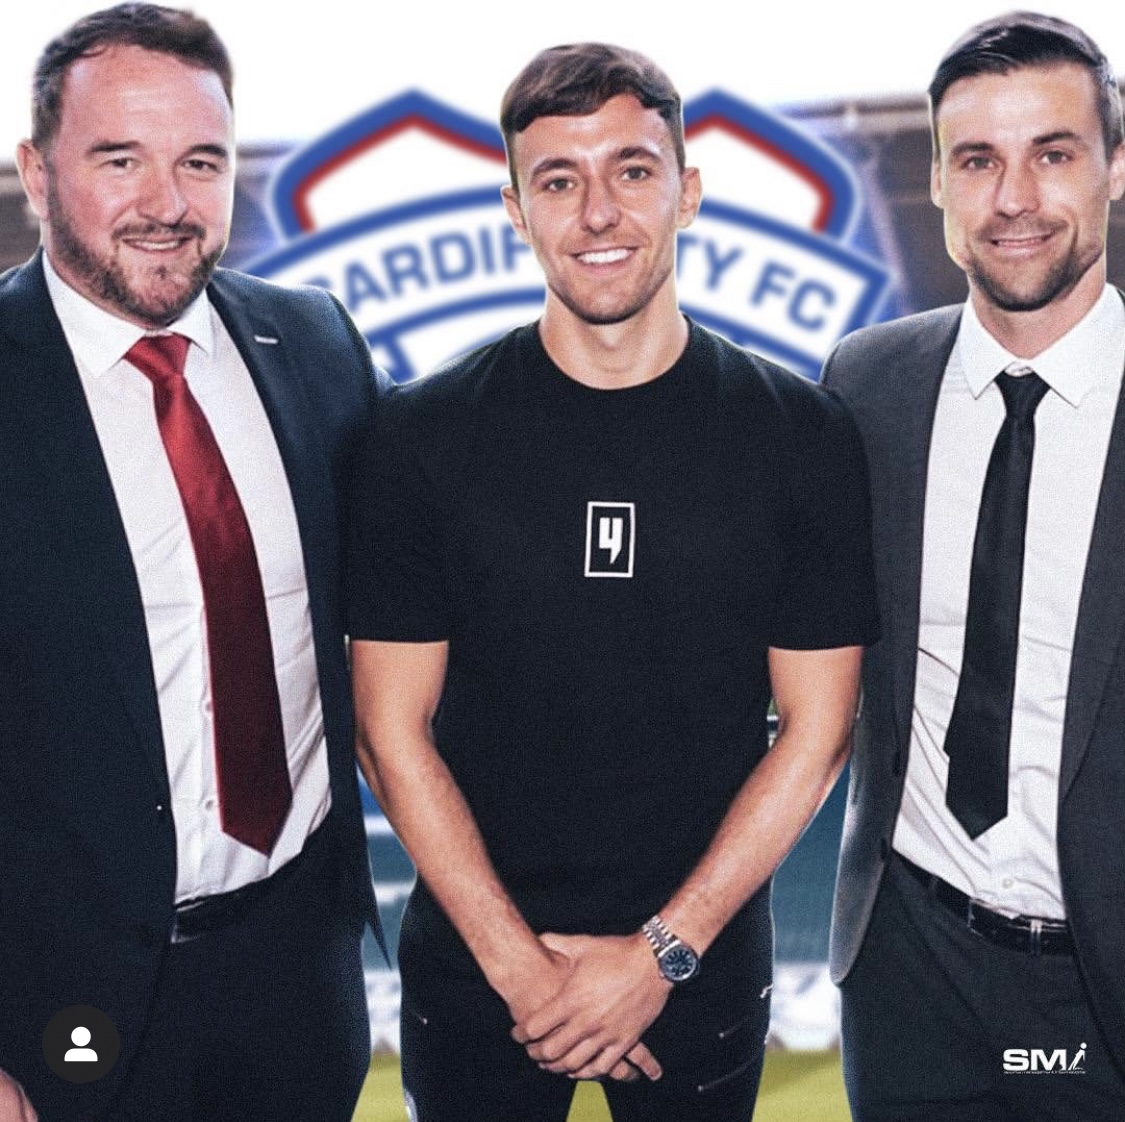 Ryan Wintle joins Cardiff City